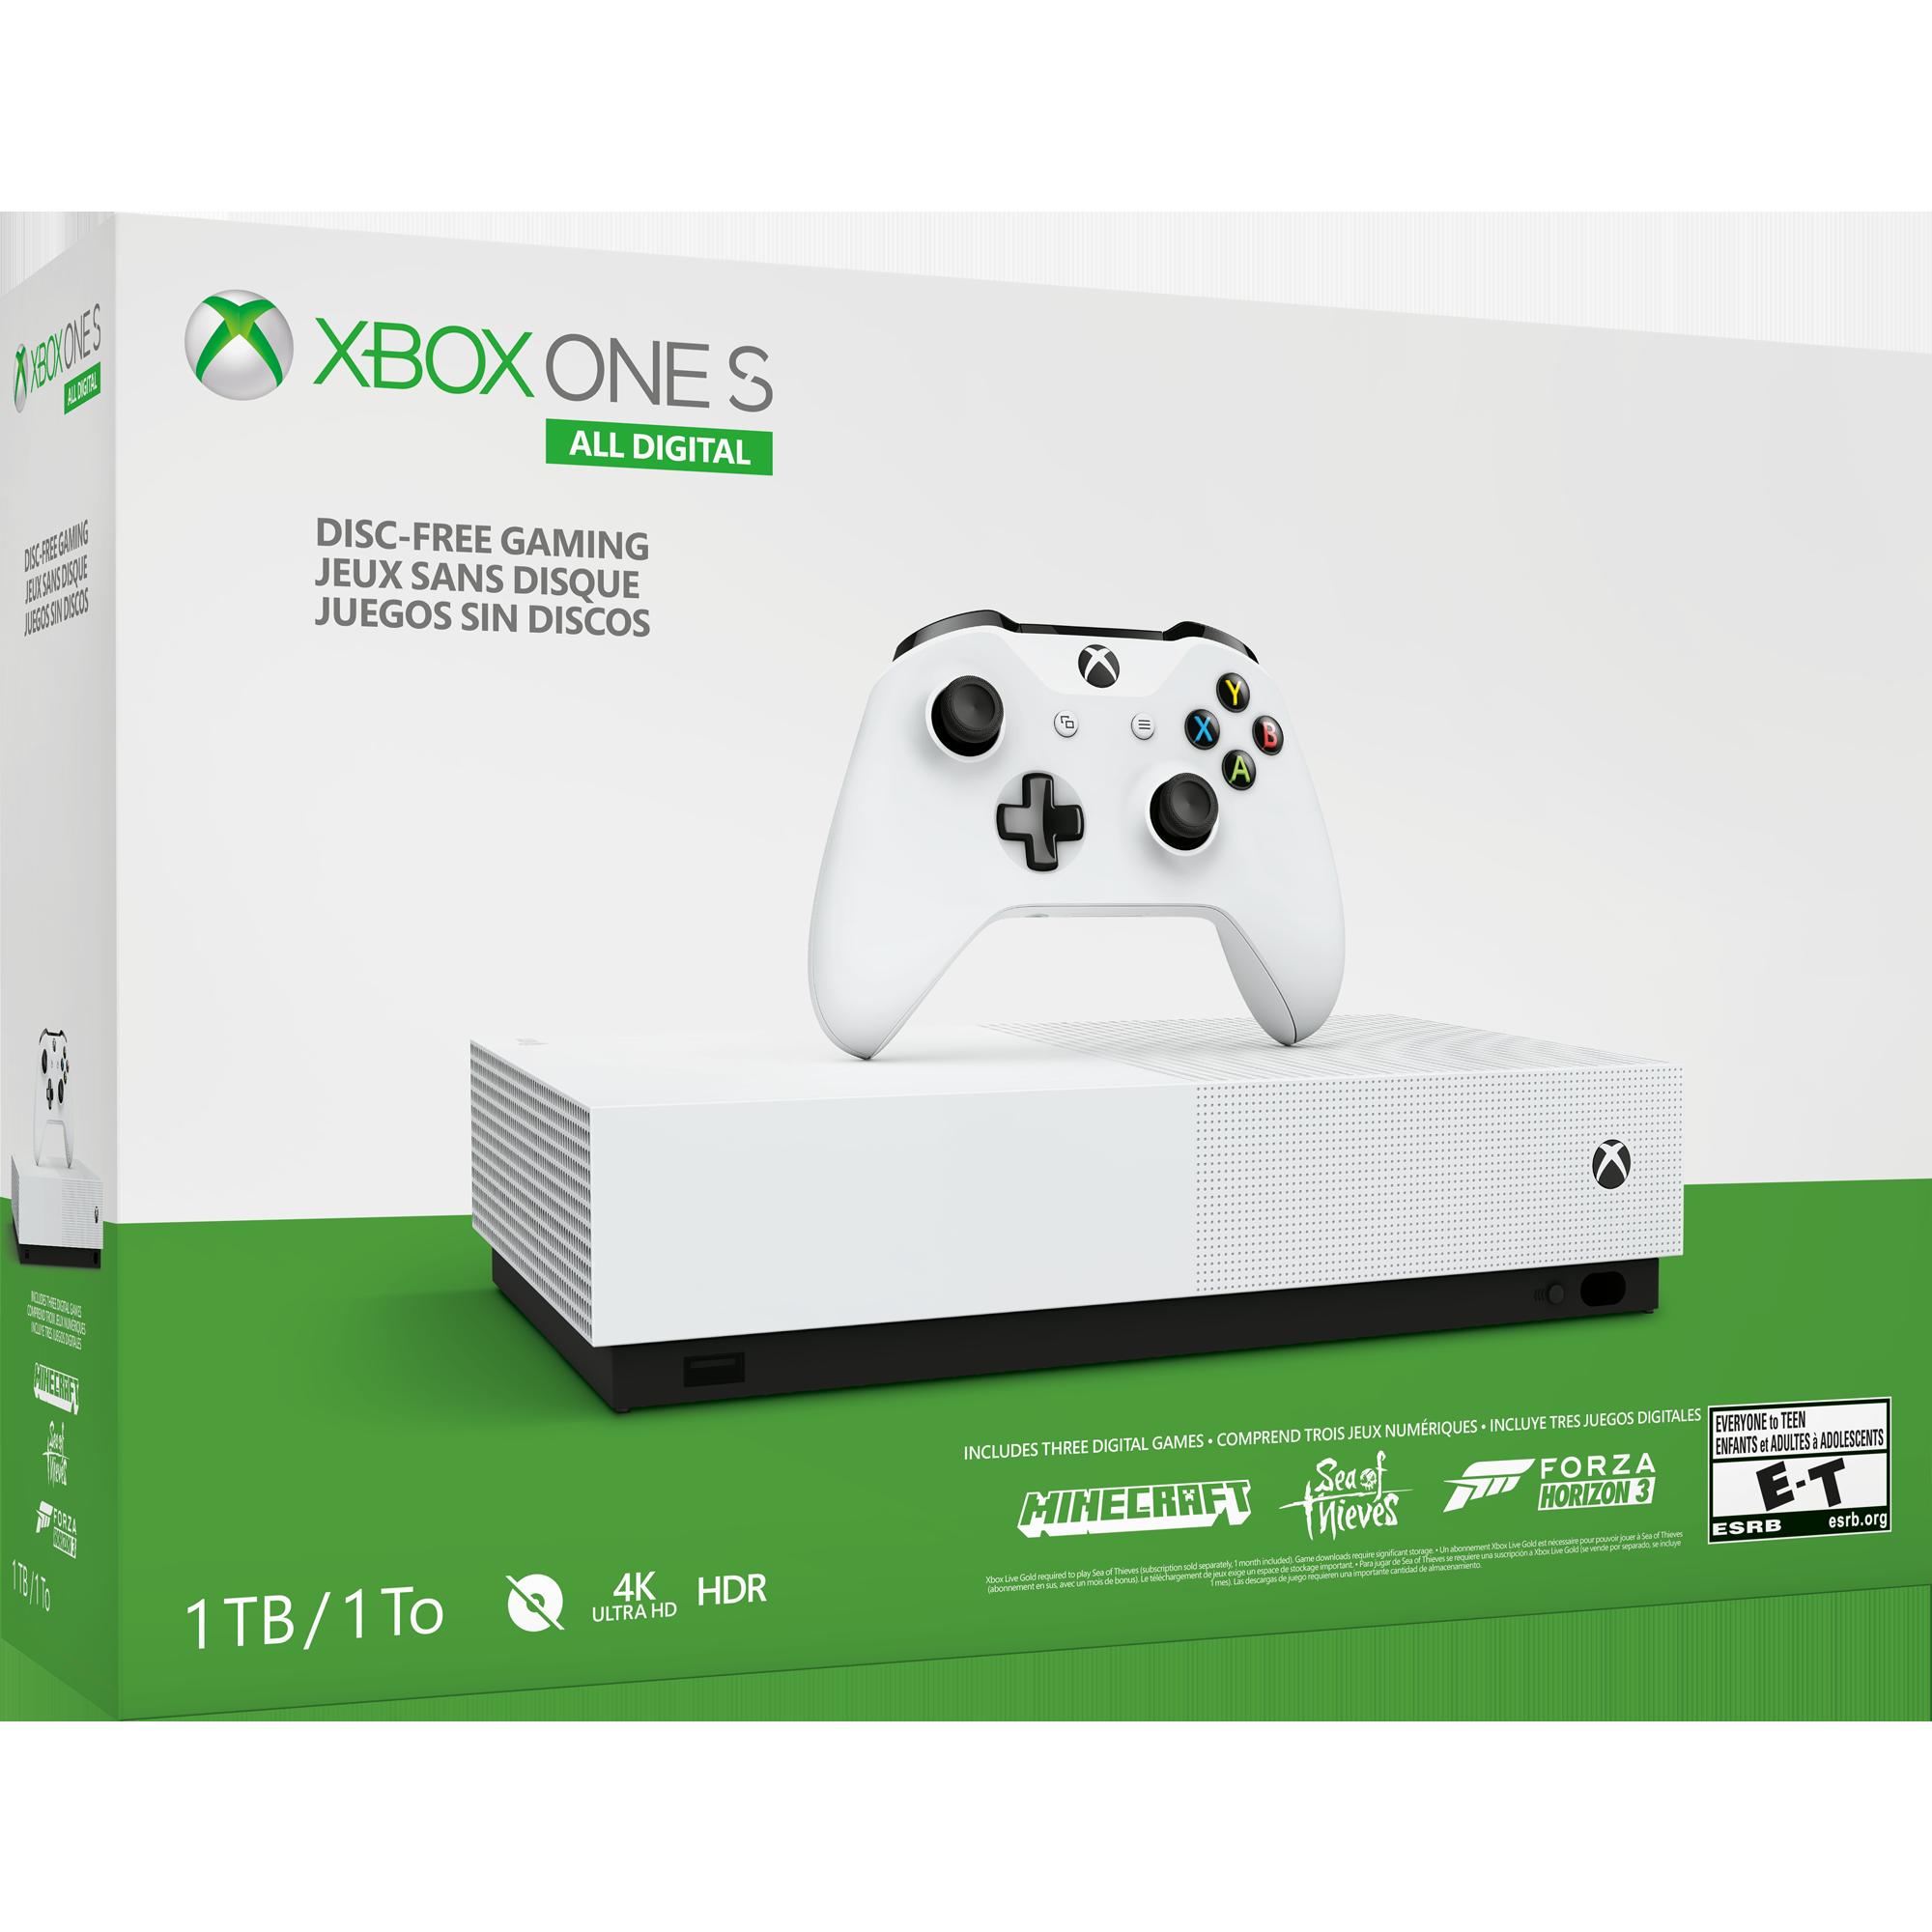 Xbox One S All-Digital Edition | Xbox